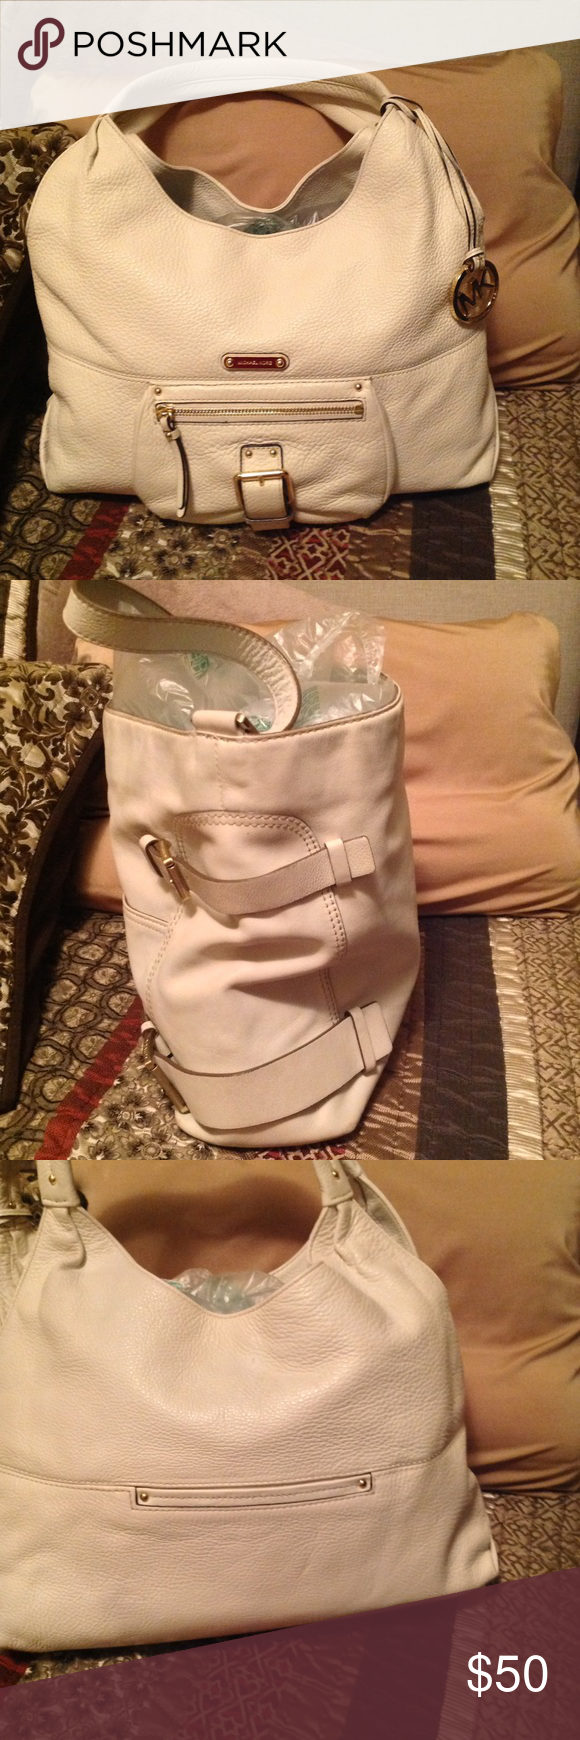 Michael Kors cream hand bag Michael Kors cream leather double strap purse. Back pocket lots of room good condition. Michael Kors Bags